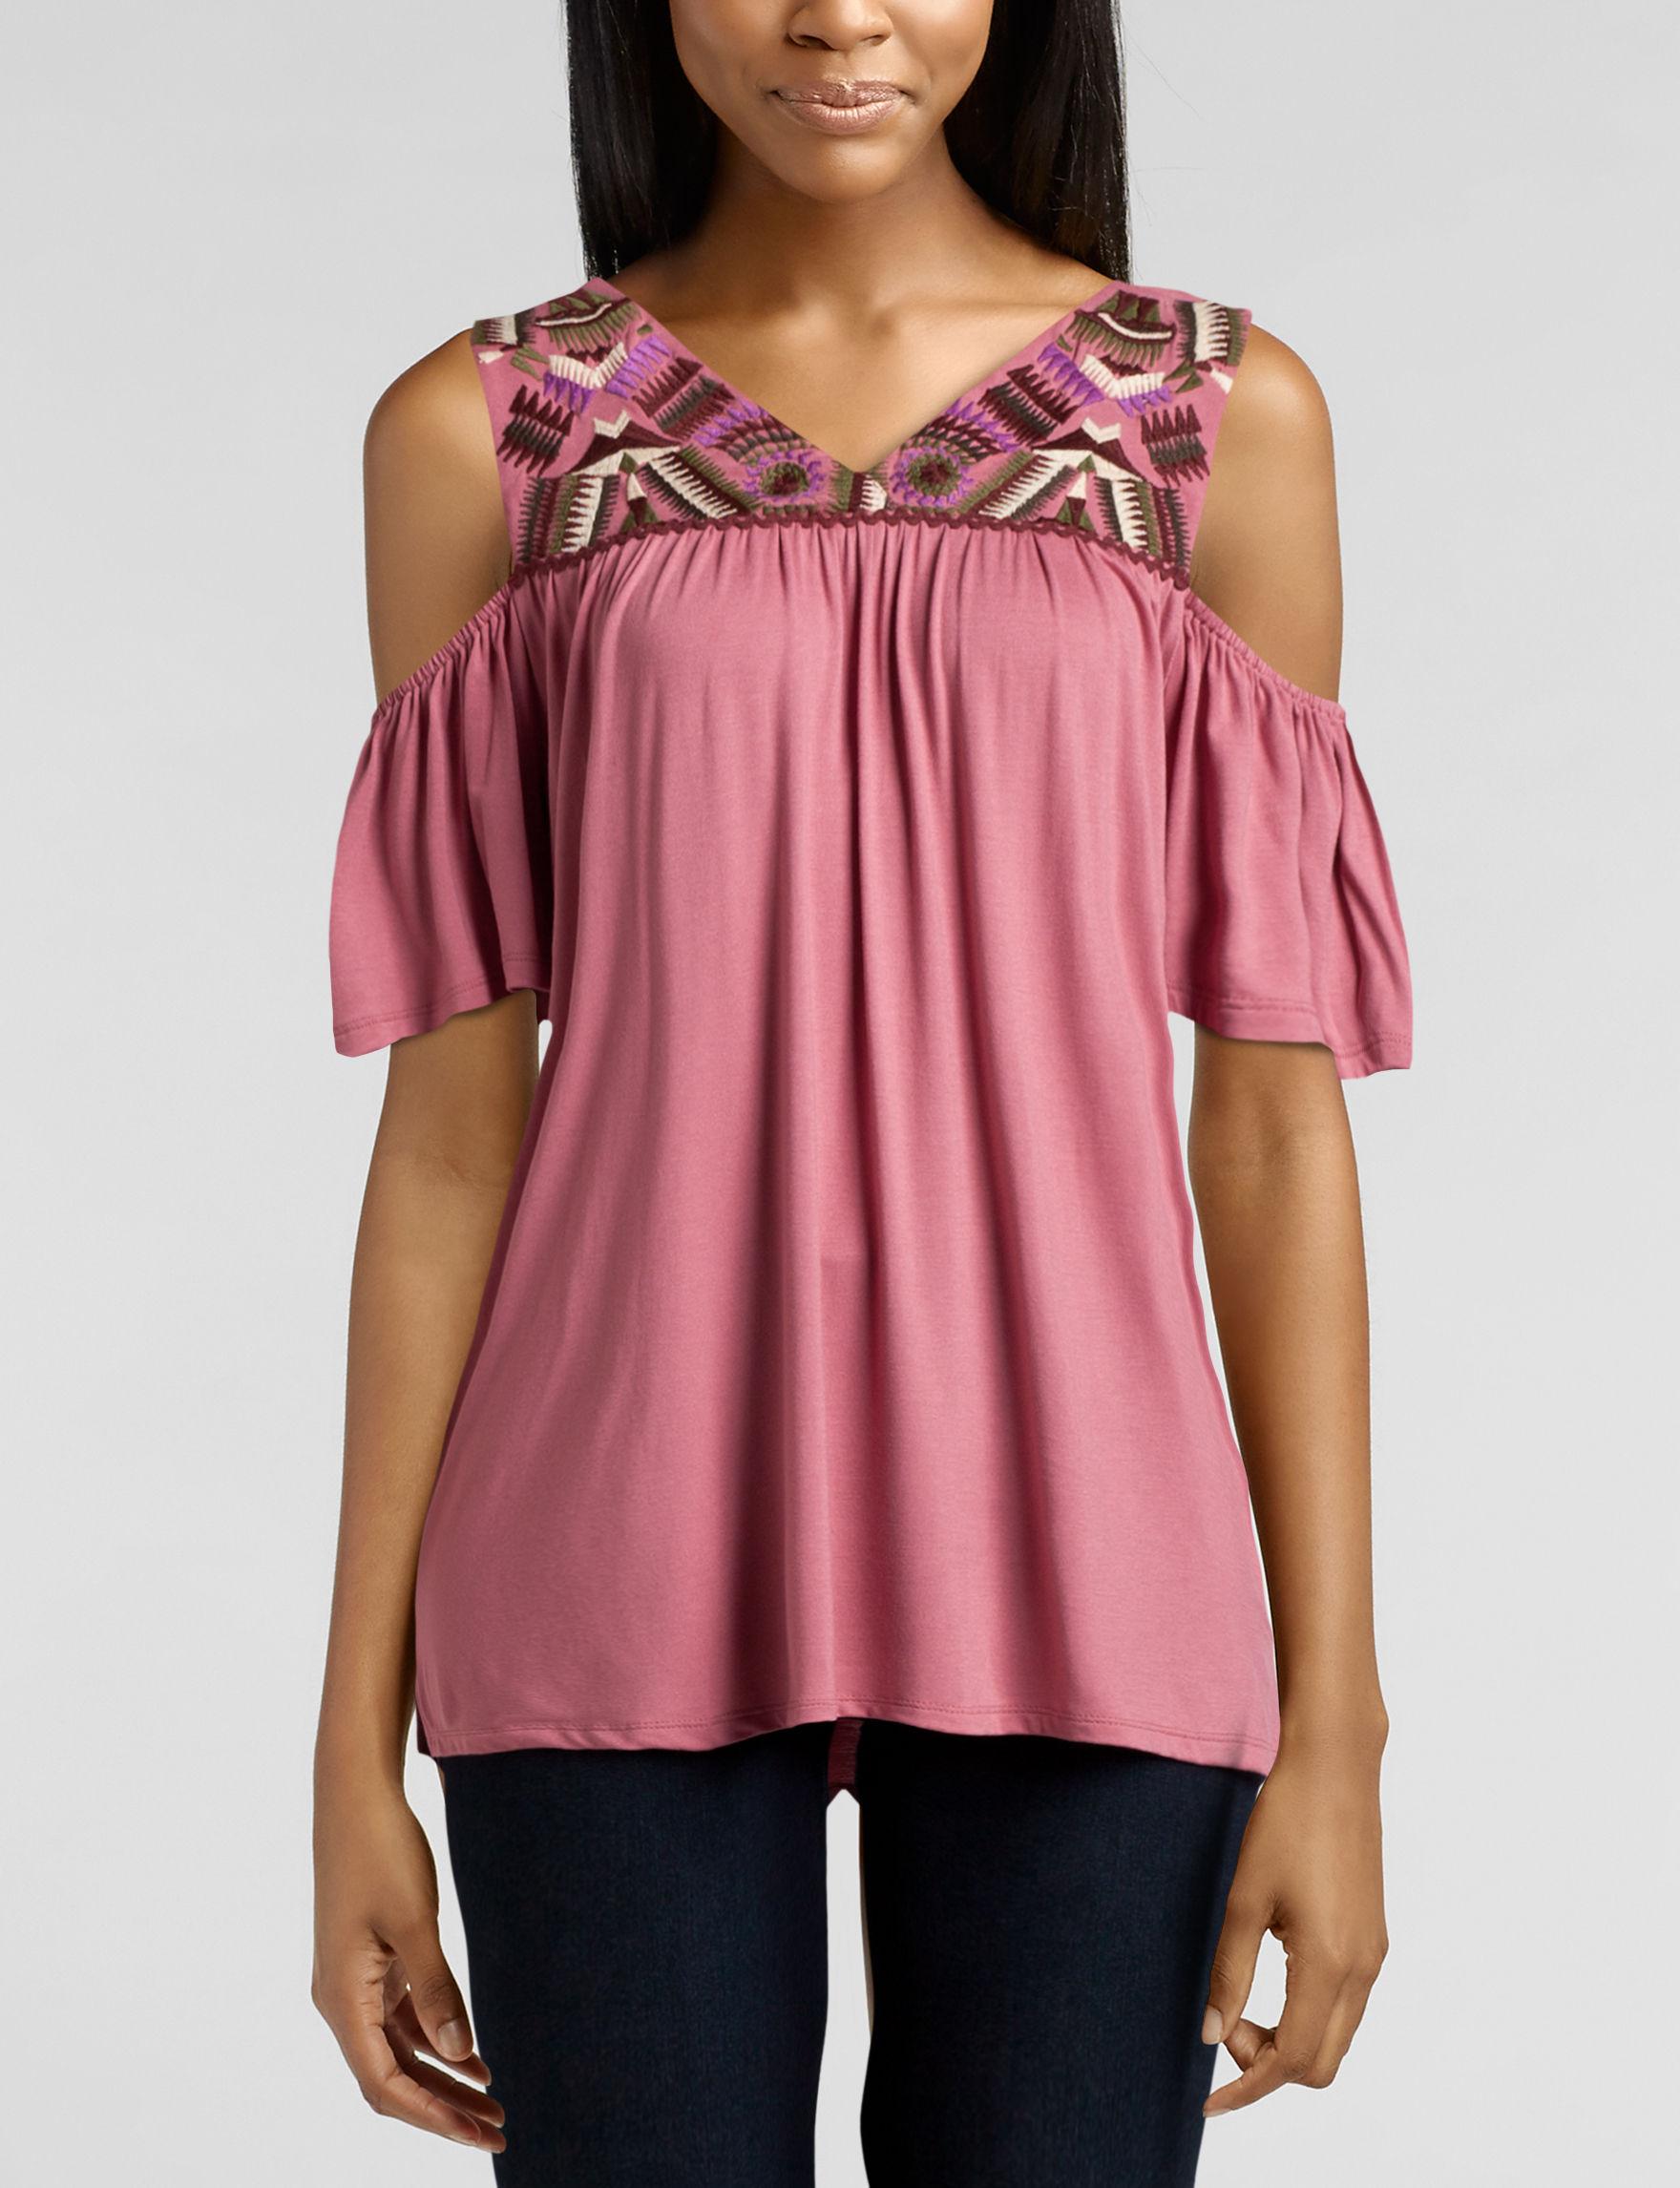 Hannah Mauve Shirts & Blouses